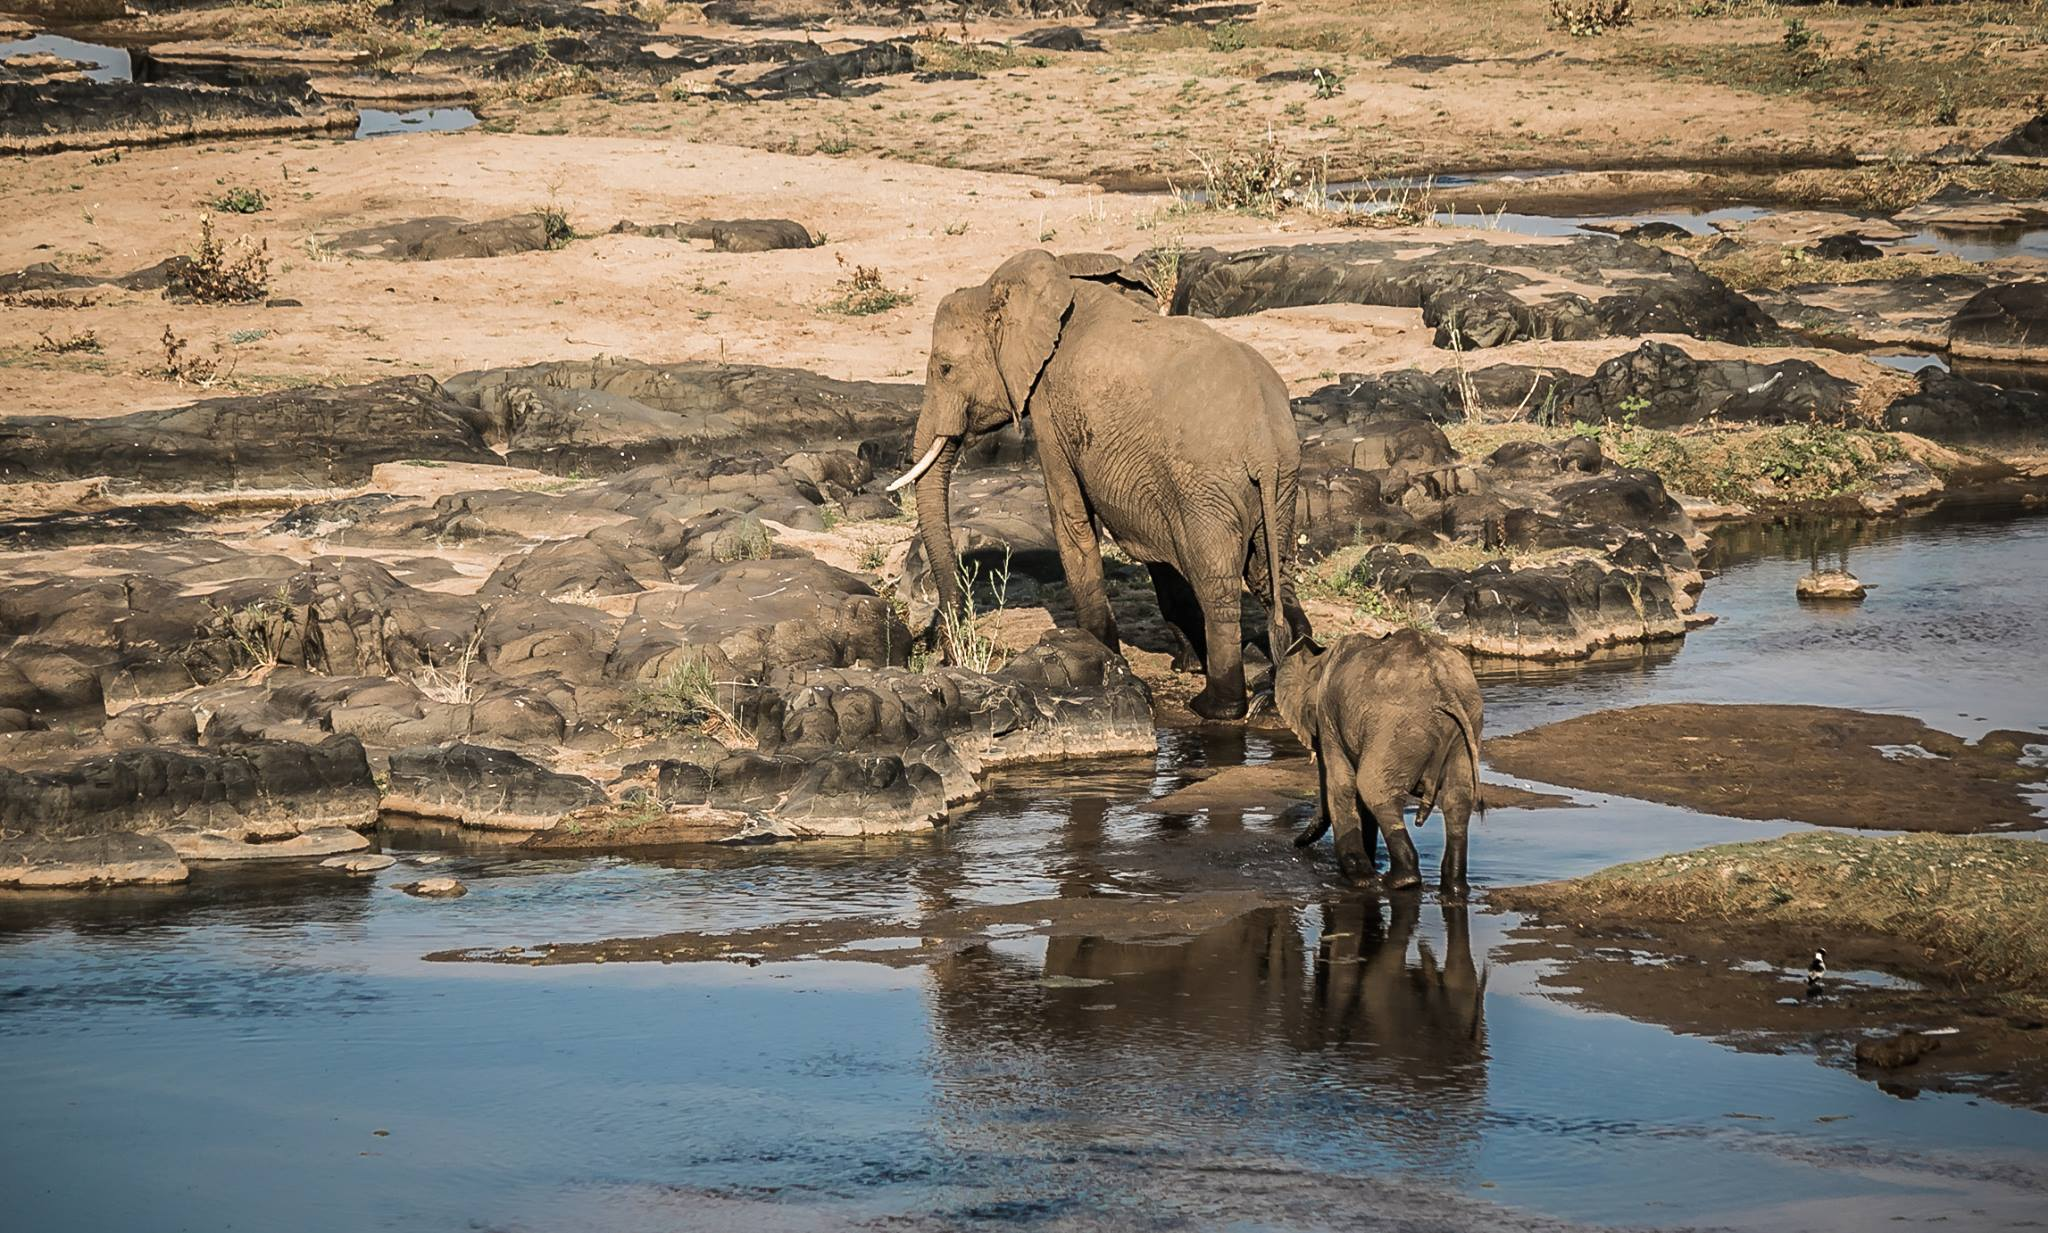 Elephants in the Olifants